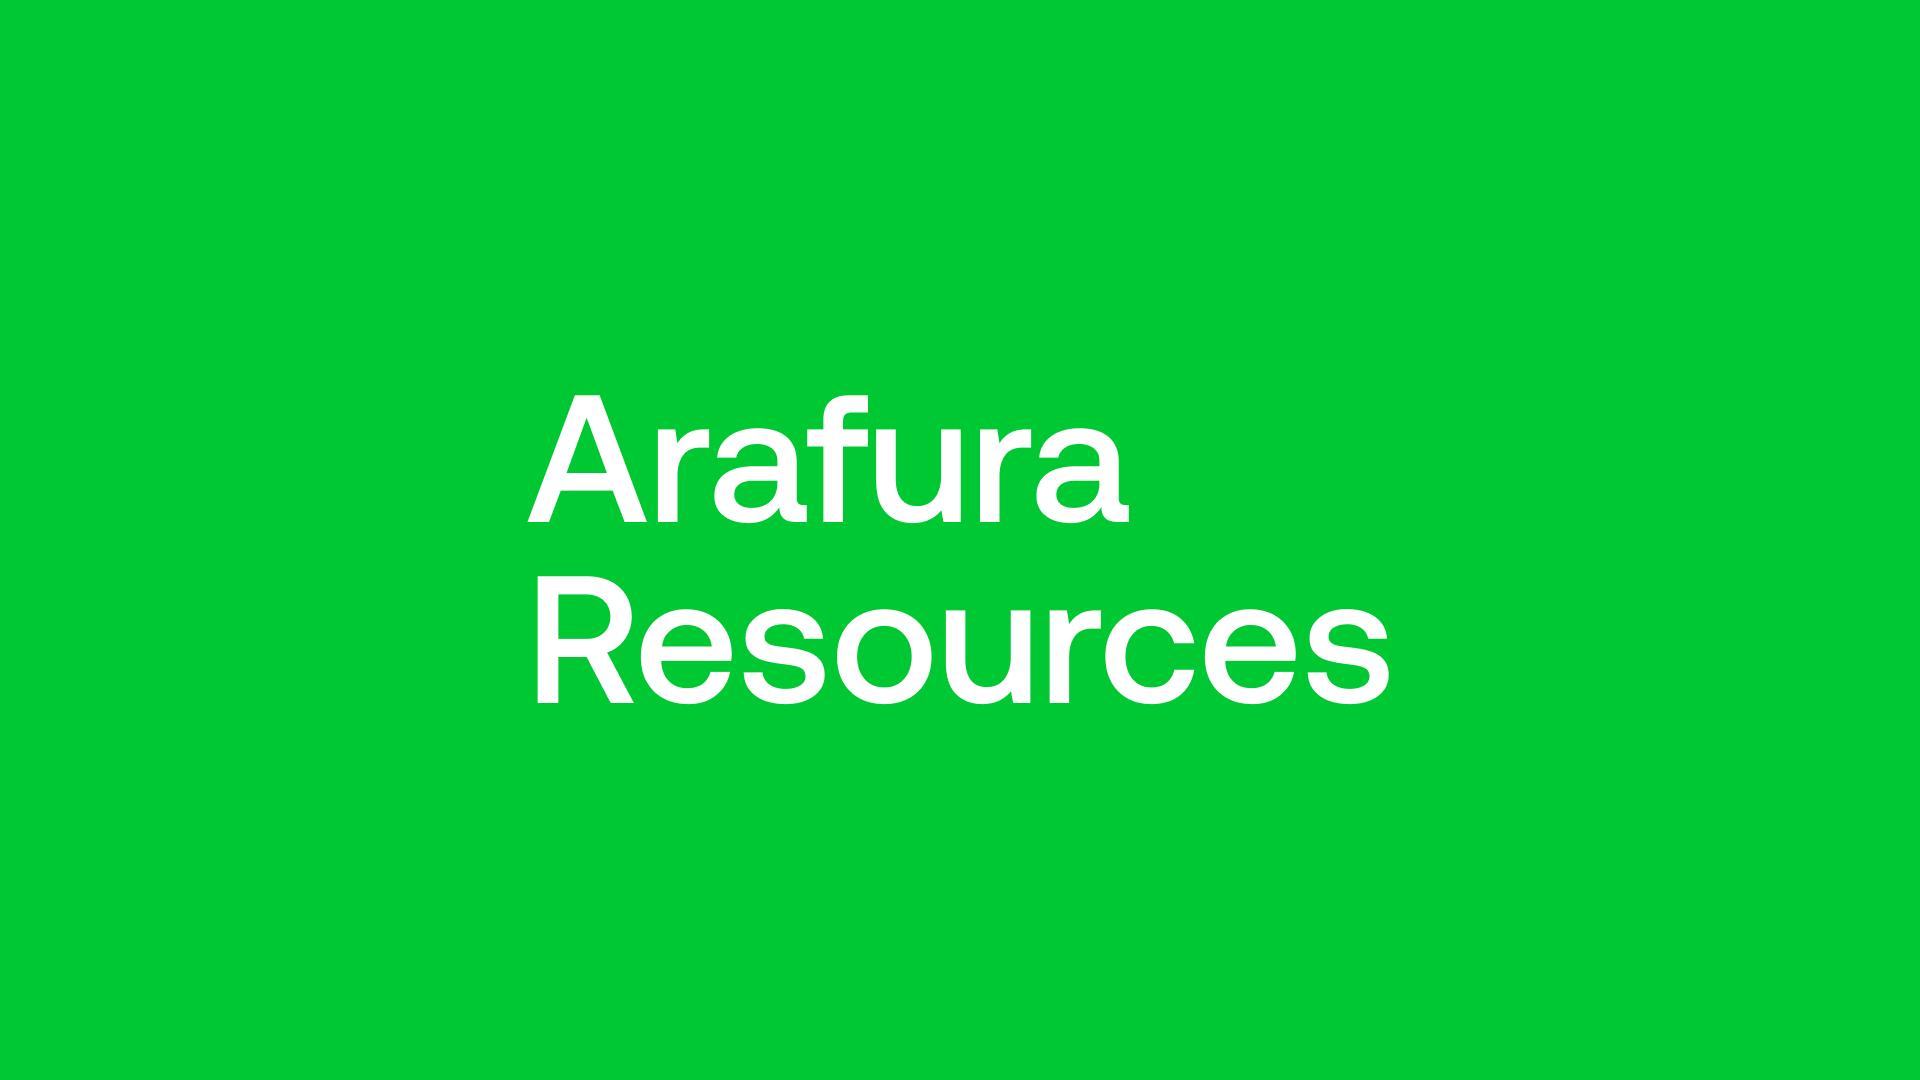 Arafura Resources (ARU) - Financing Options Leaning Towards Europe